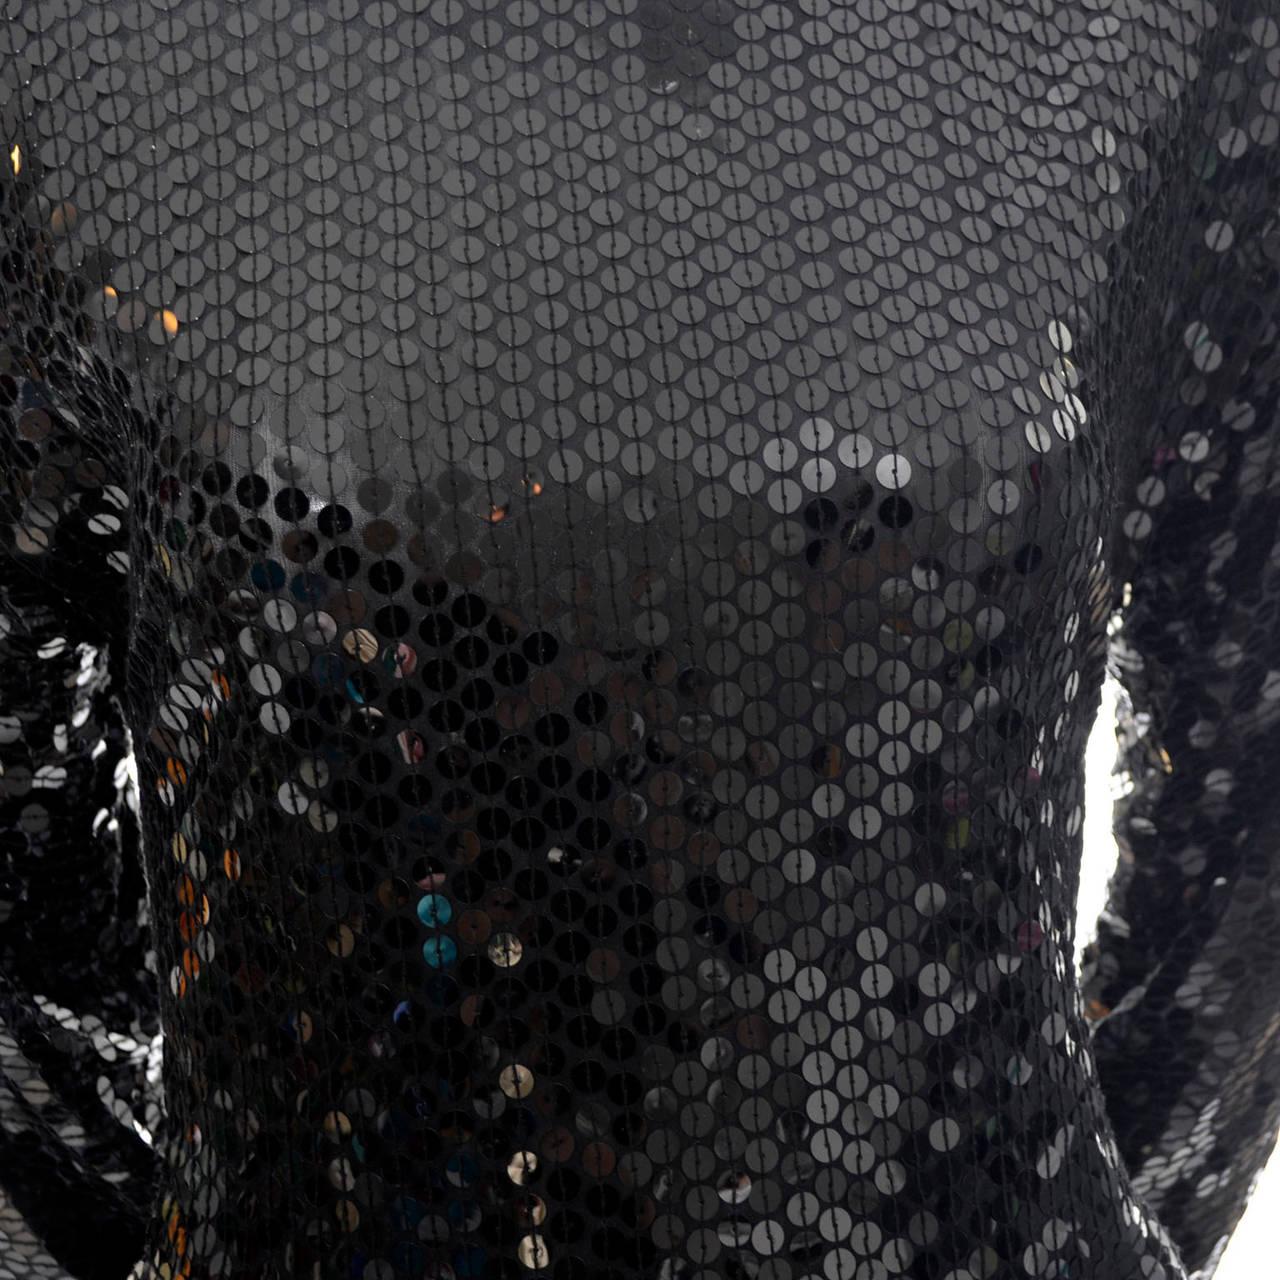 Oleg Cassini Vintage Dress Black Sequins Peplum 1980s Evening For Sale 1